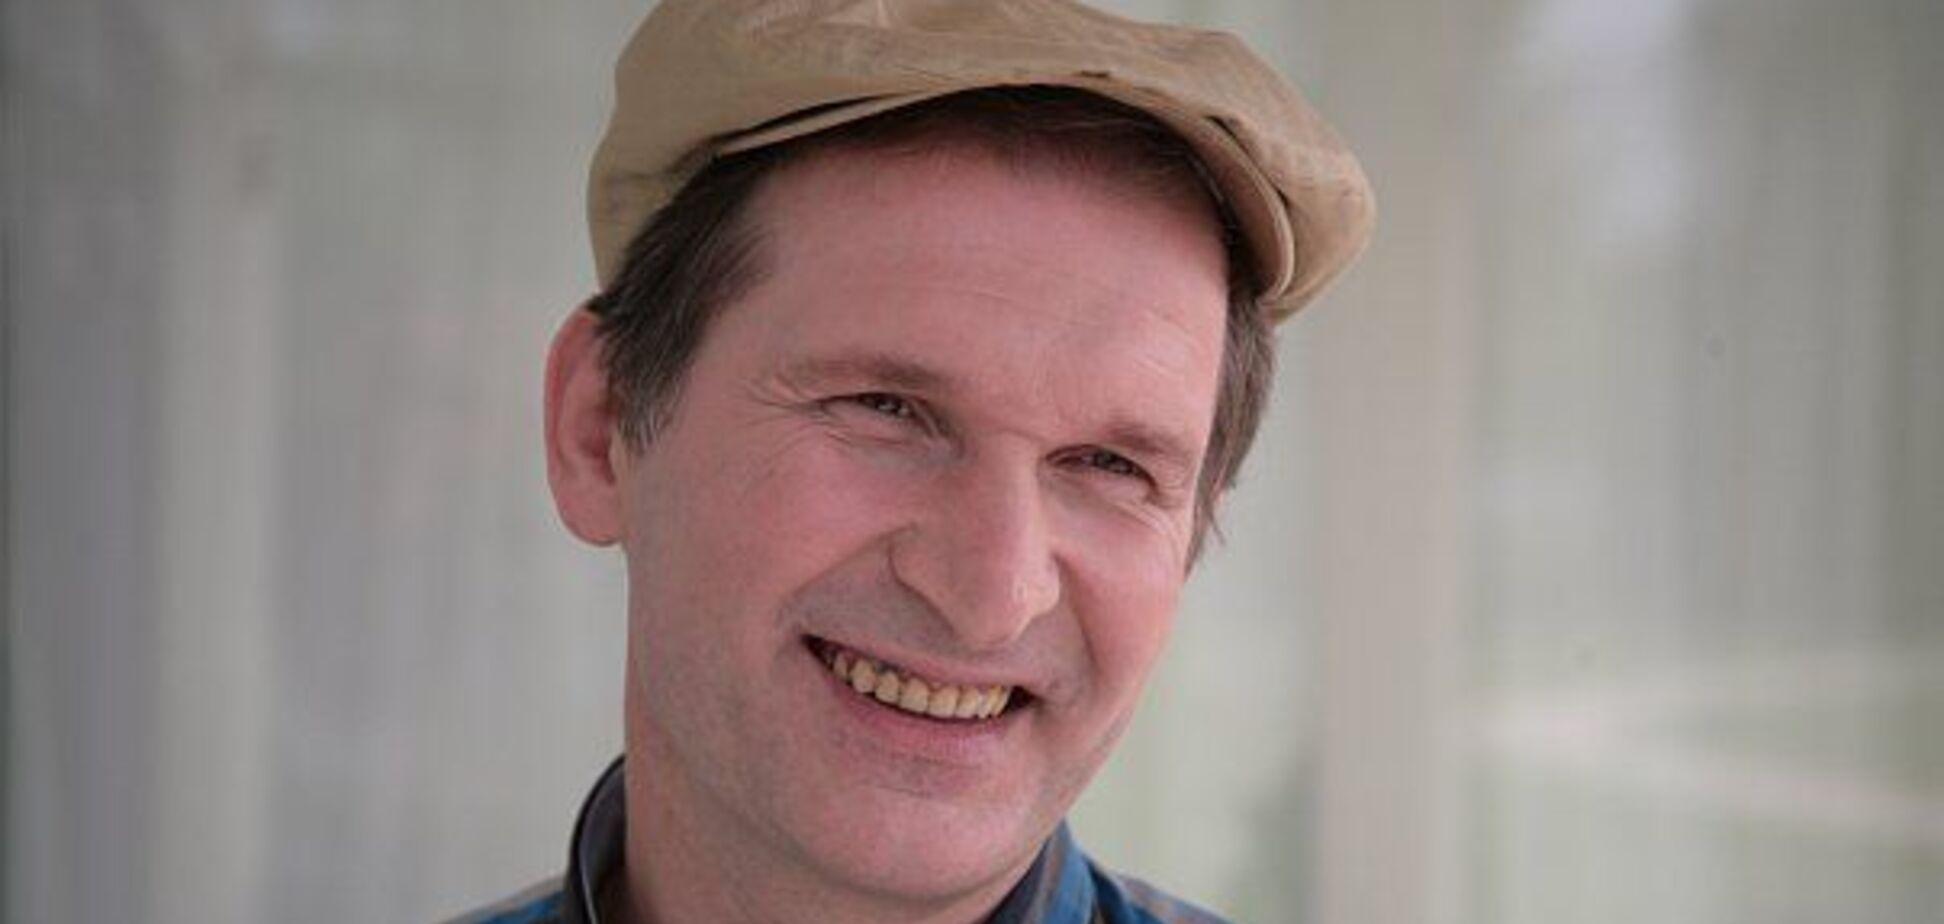 'Крымнашист' Добронравов получил орден от Путина: за какие заслуги